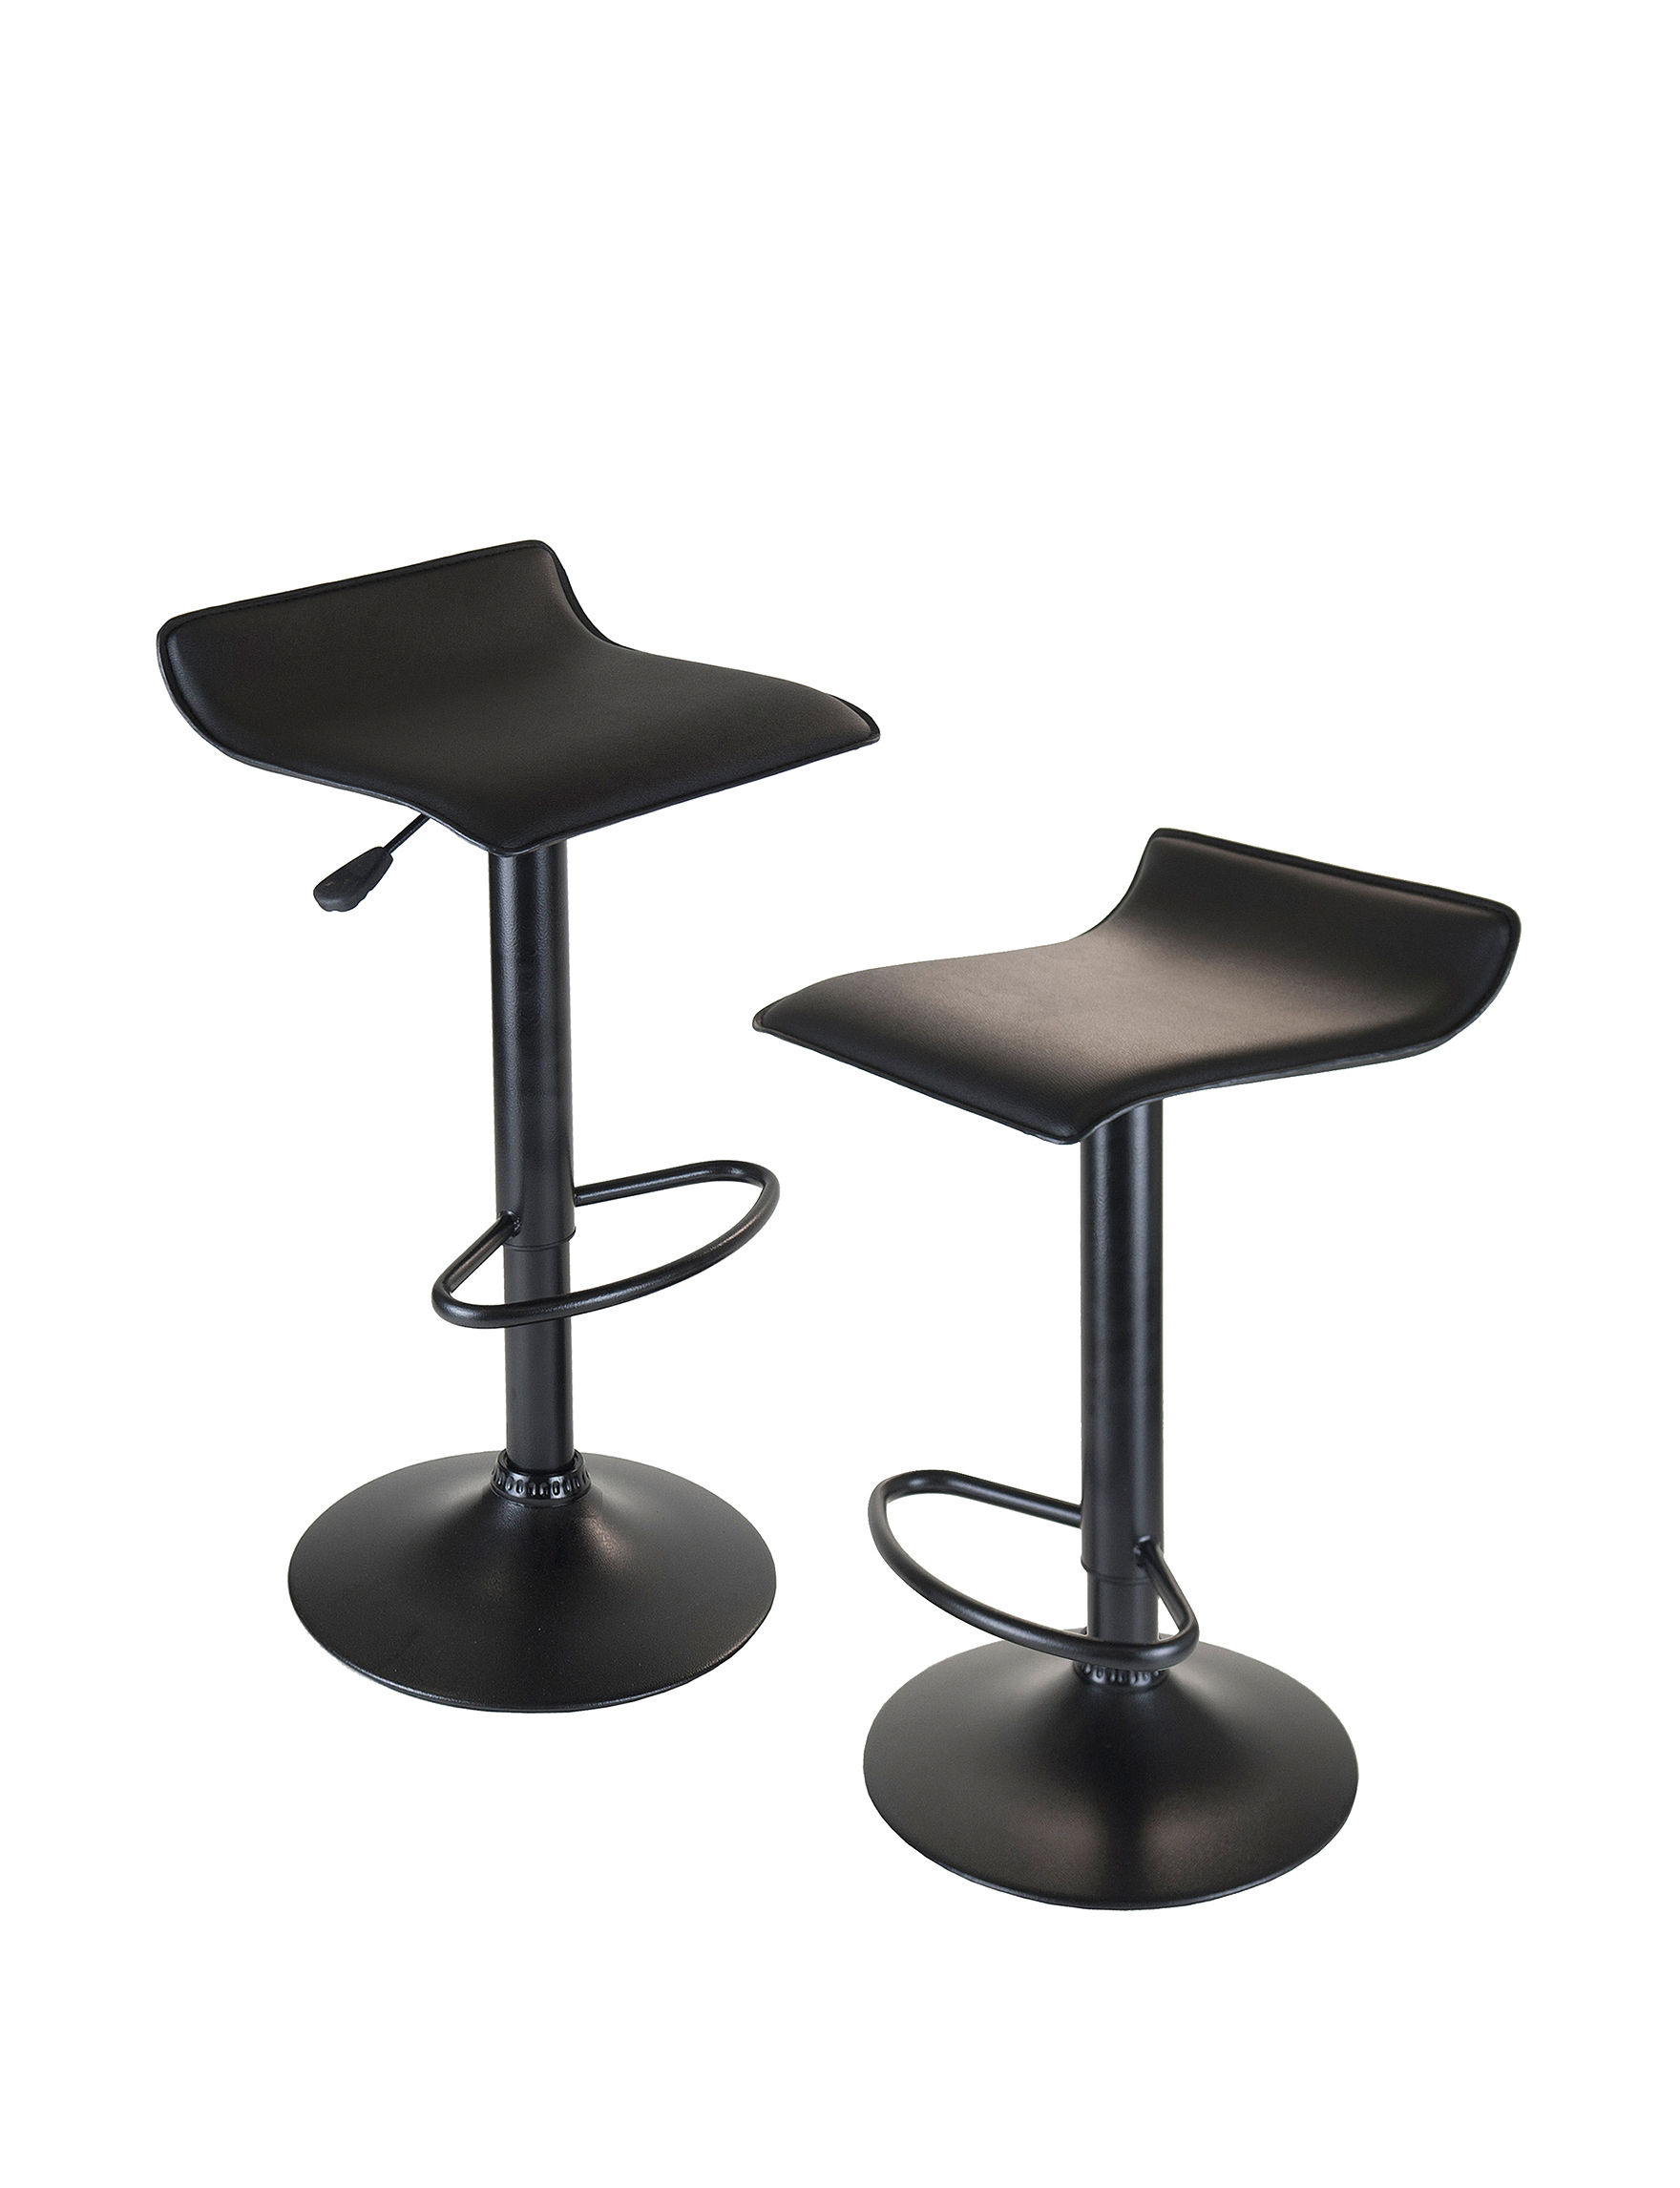 Winsome Black Bar & Kitchen Stools Kitchen & Dining Furniture